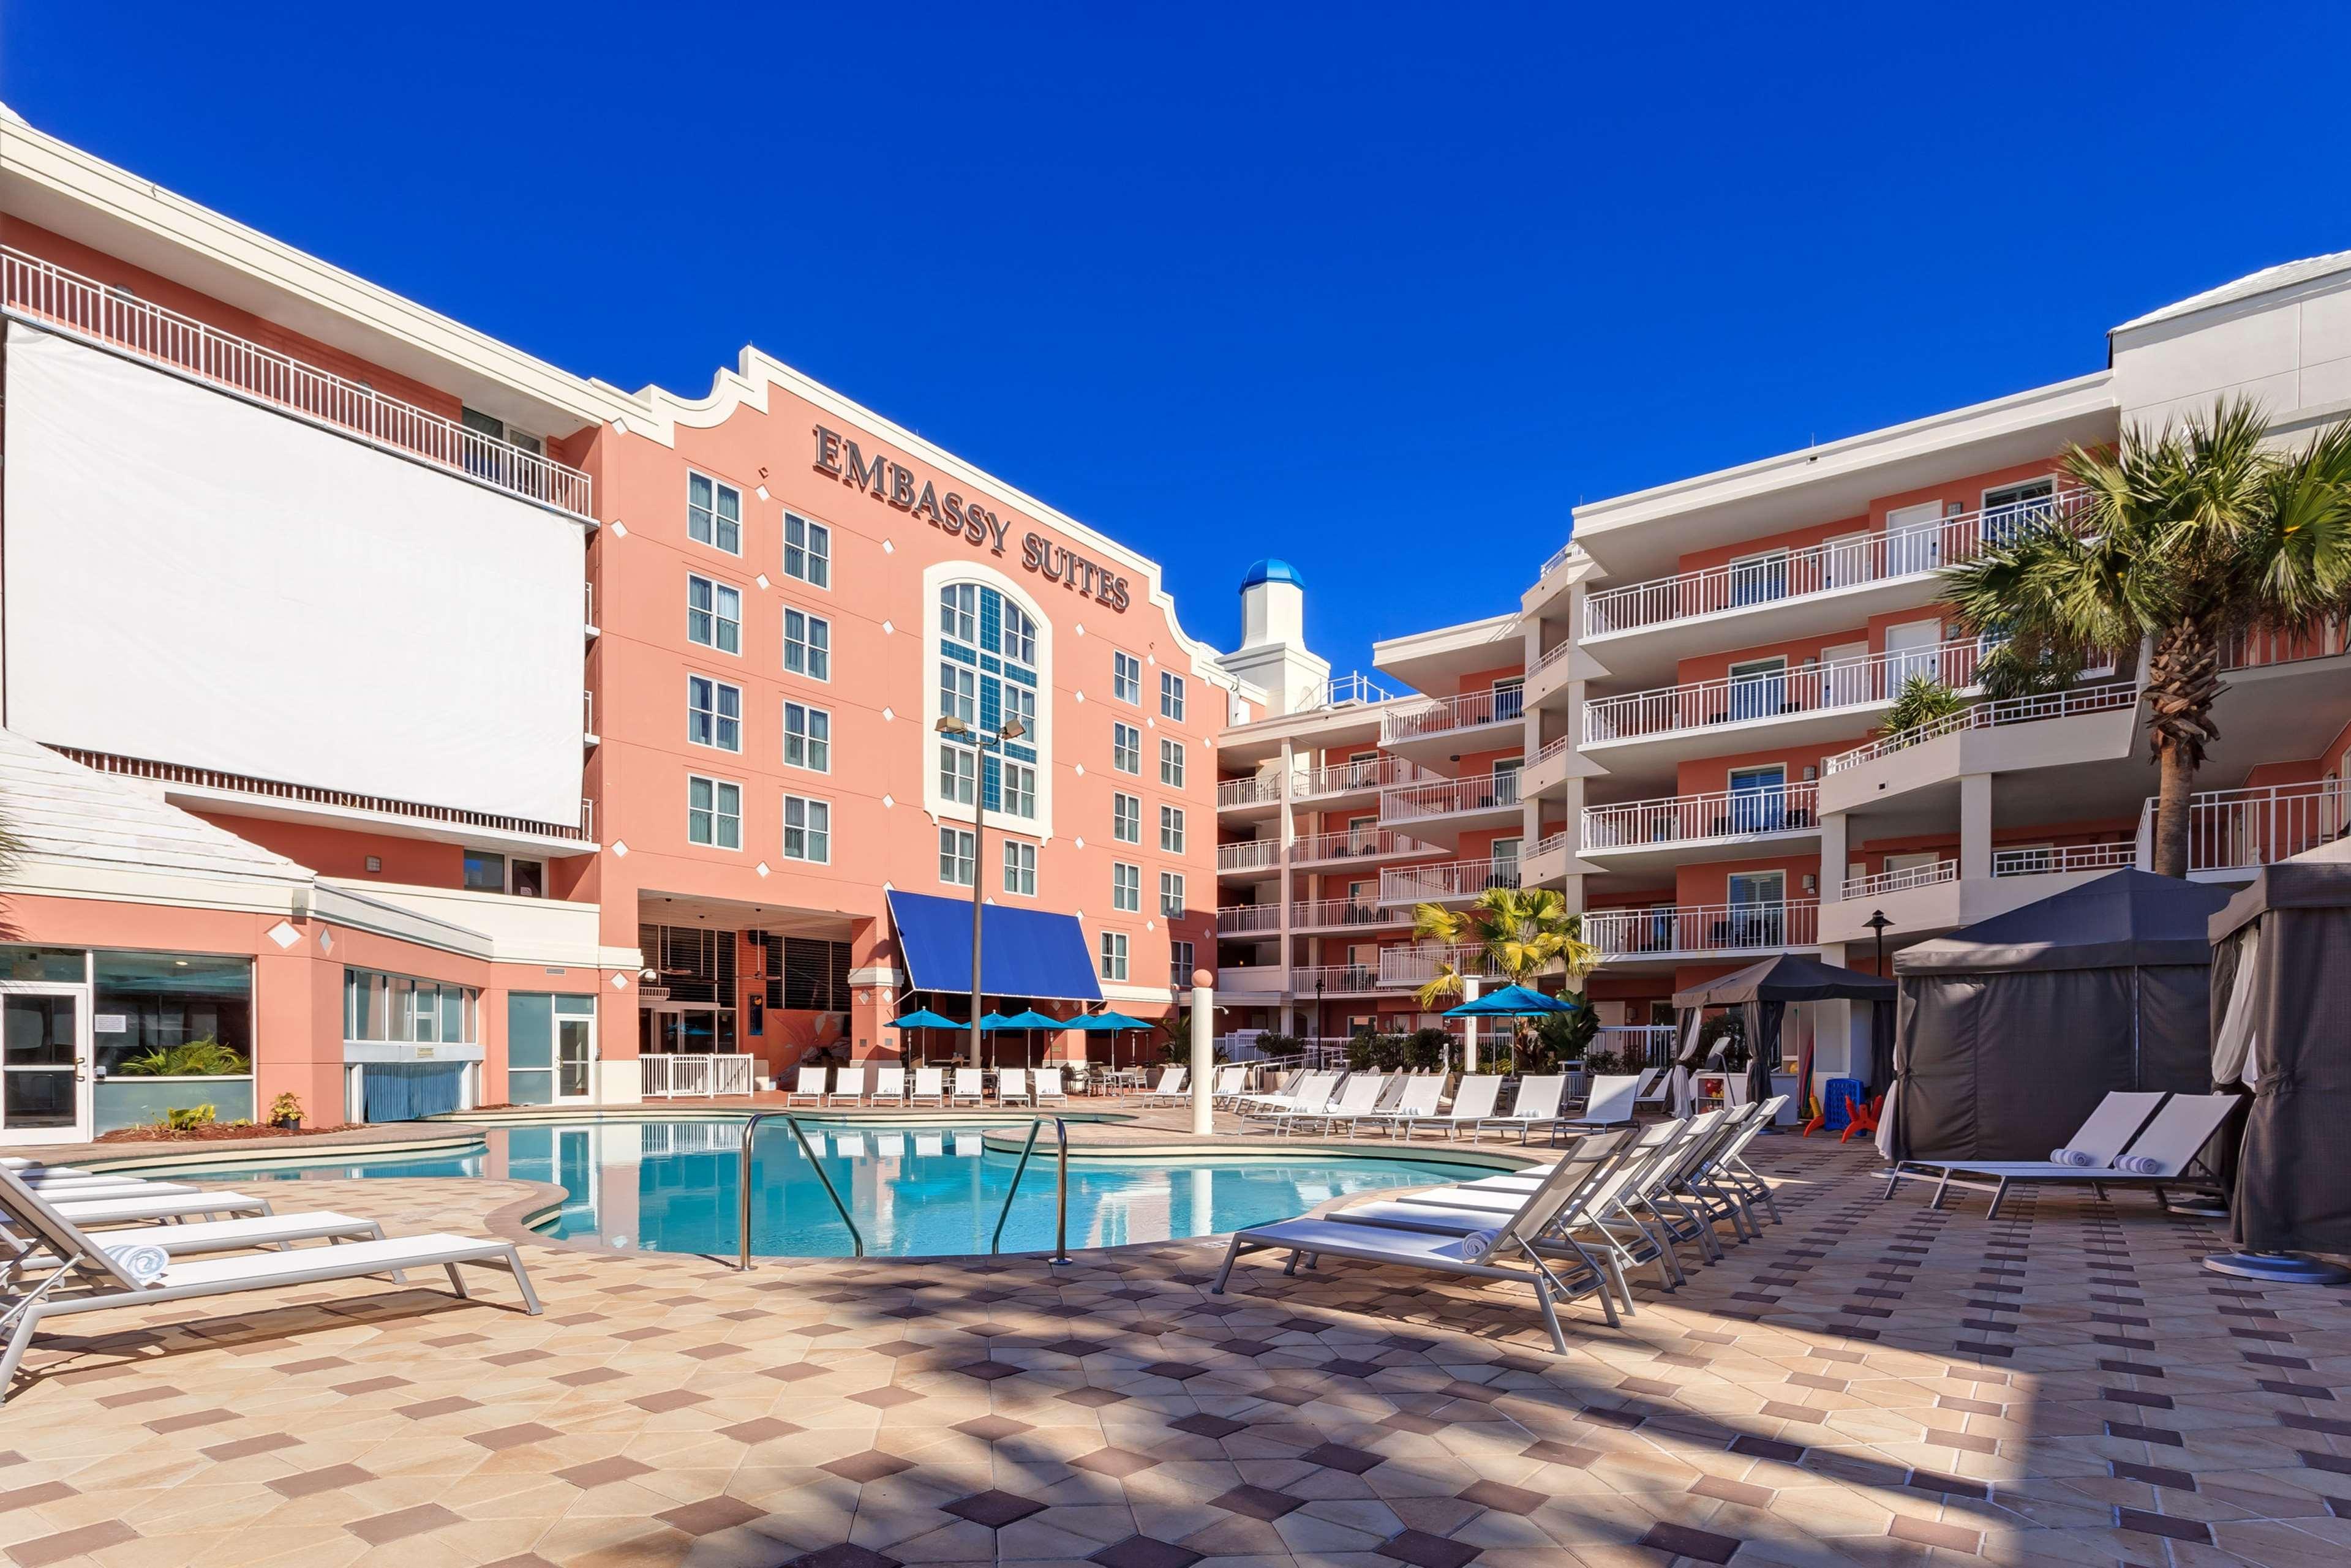 Embassy Suites by Hilton Orlando Lake Buena Vista Resort image 8